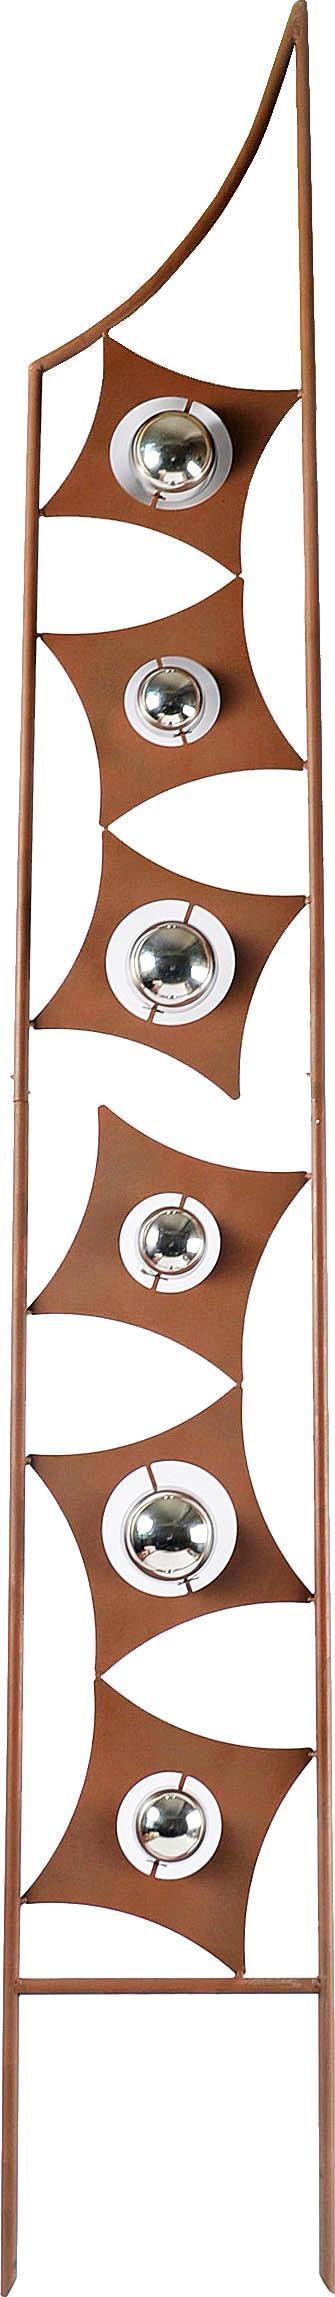 Home affaire Deko-Windrad Rusty Metal Wohnen/Möbel/Gartenmöbel & Gartendeko/Gartendekoration/Weitere Gartendekoration